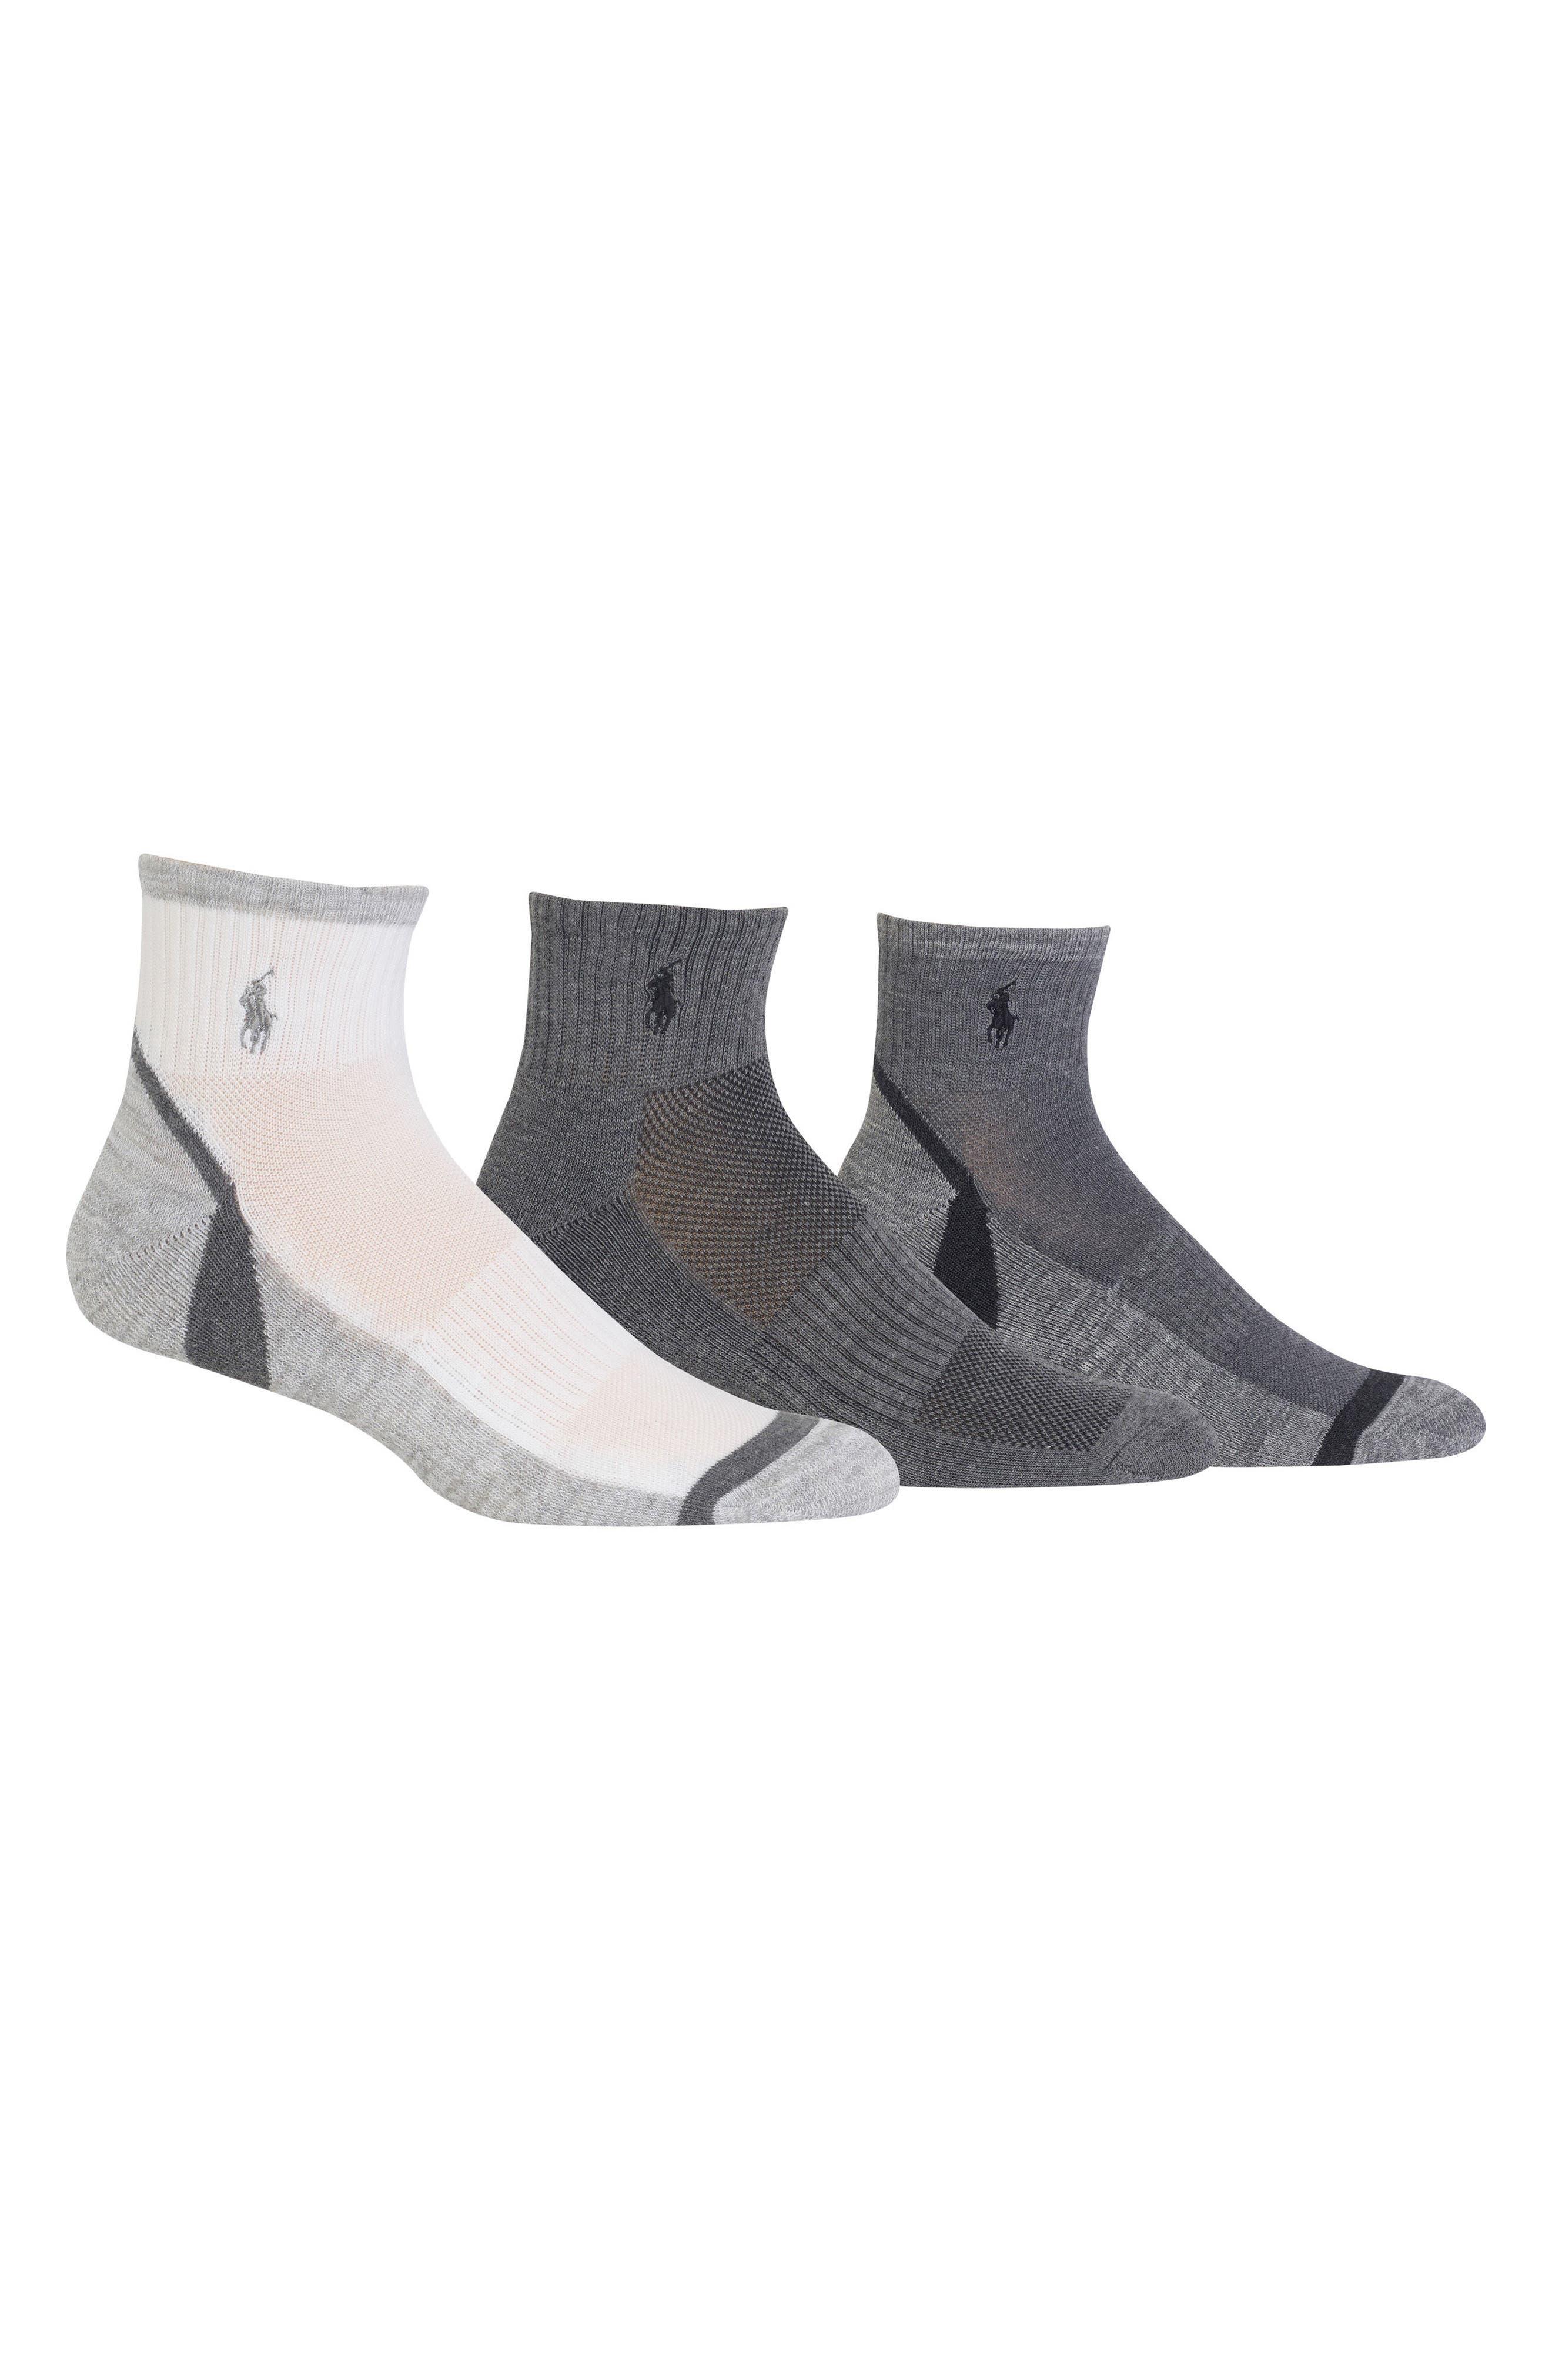 3-Pack Athletic Socks,                         Main,                         color,